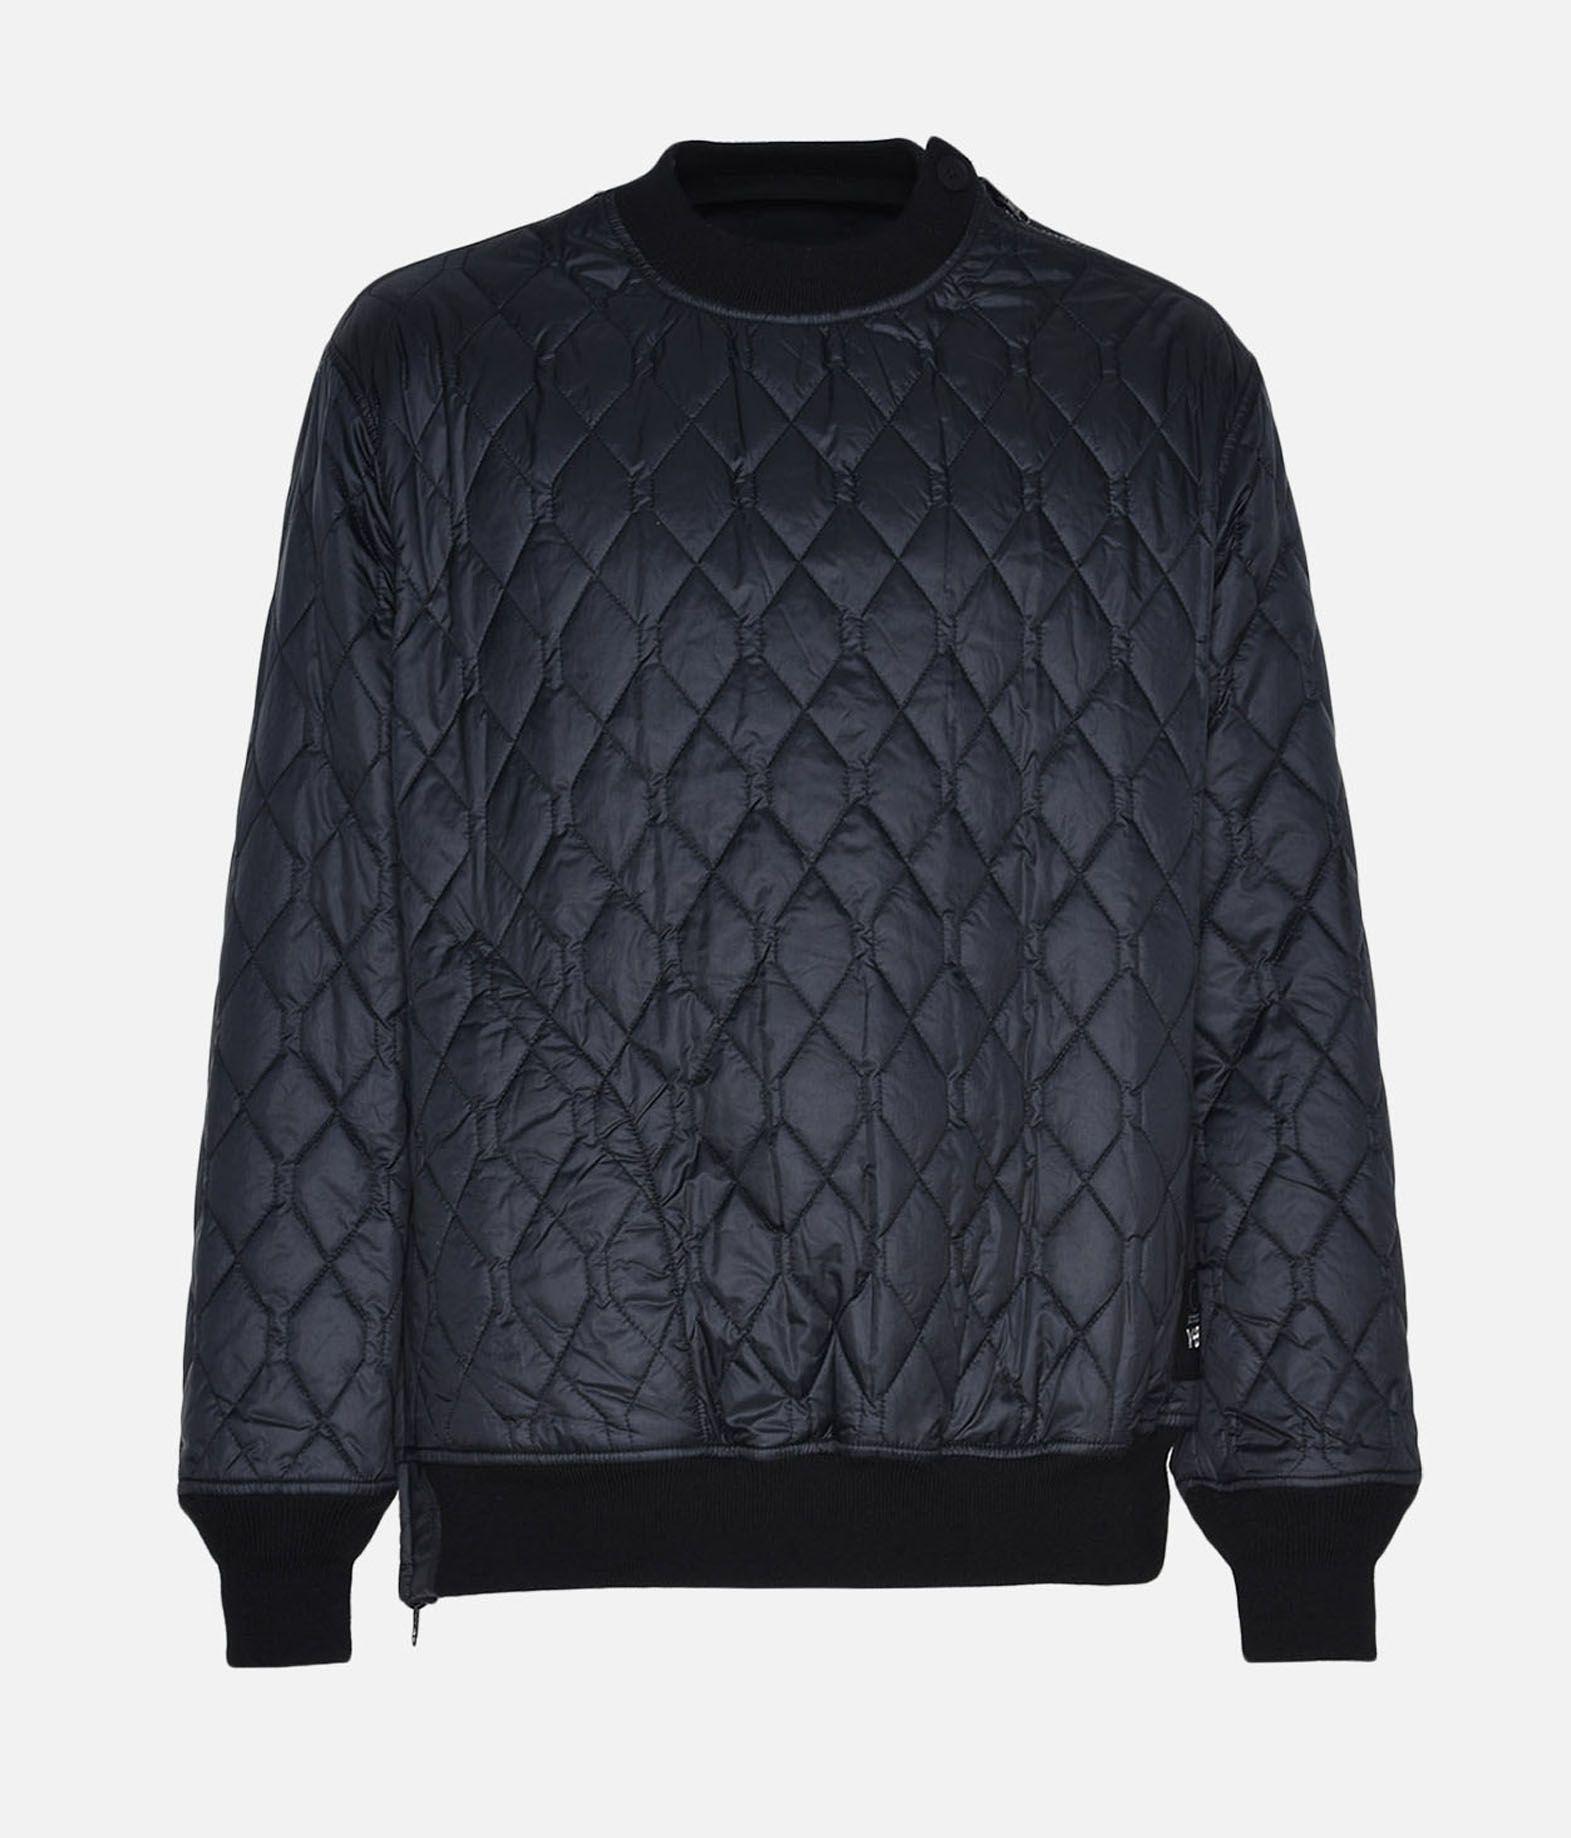 Y-3 Y-3 Quilted Sweater Sweatshirt Man f